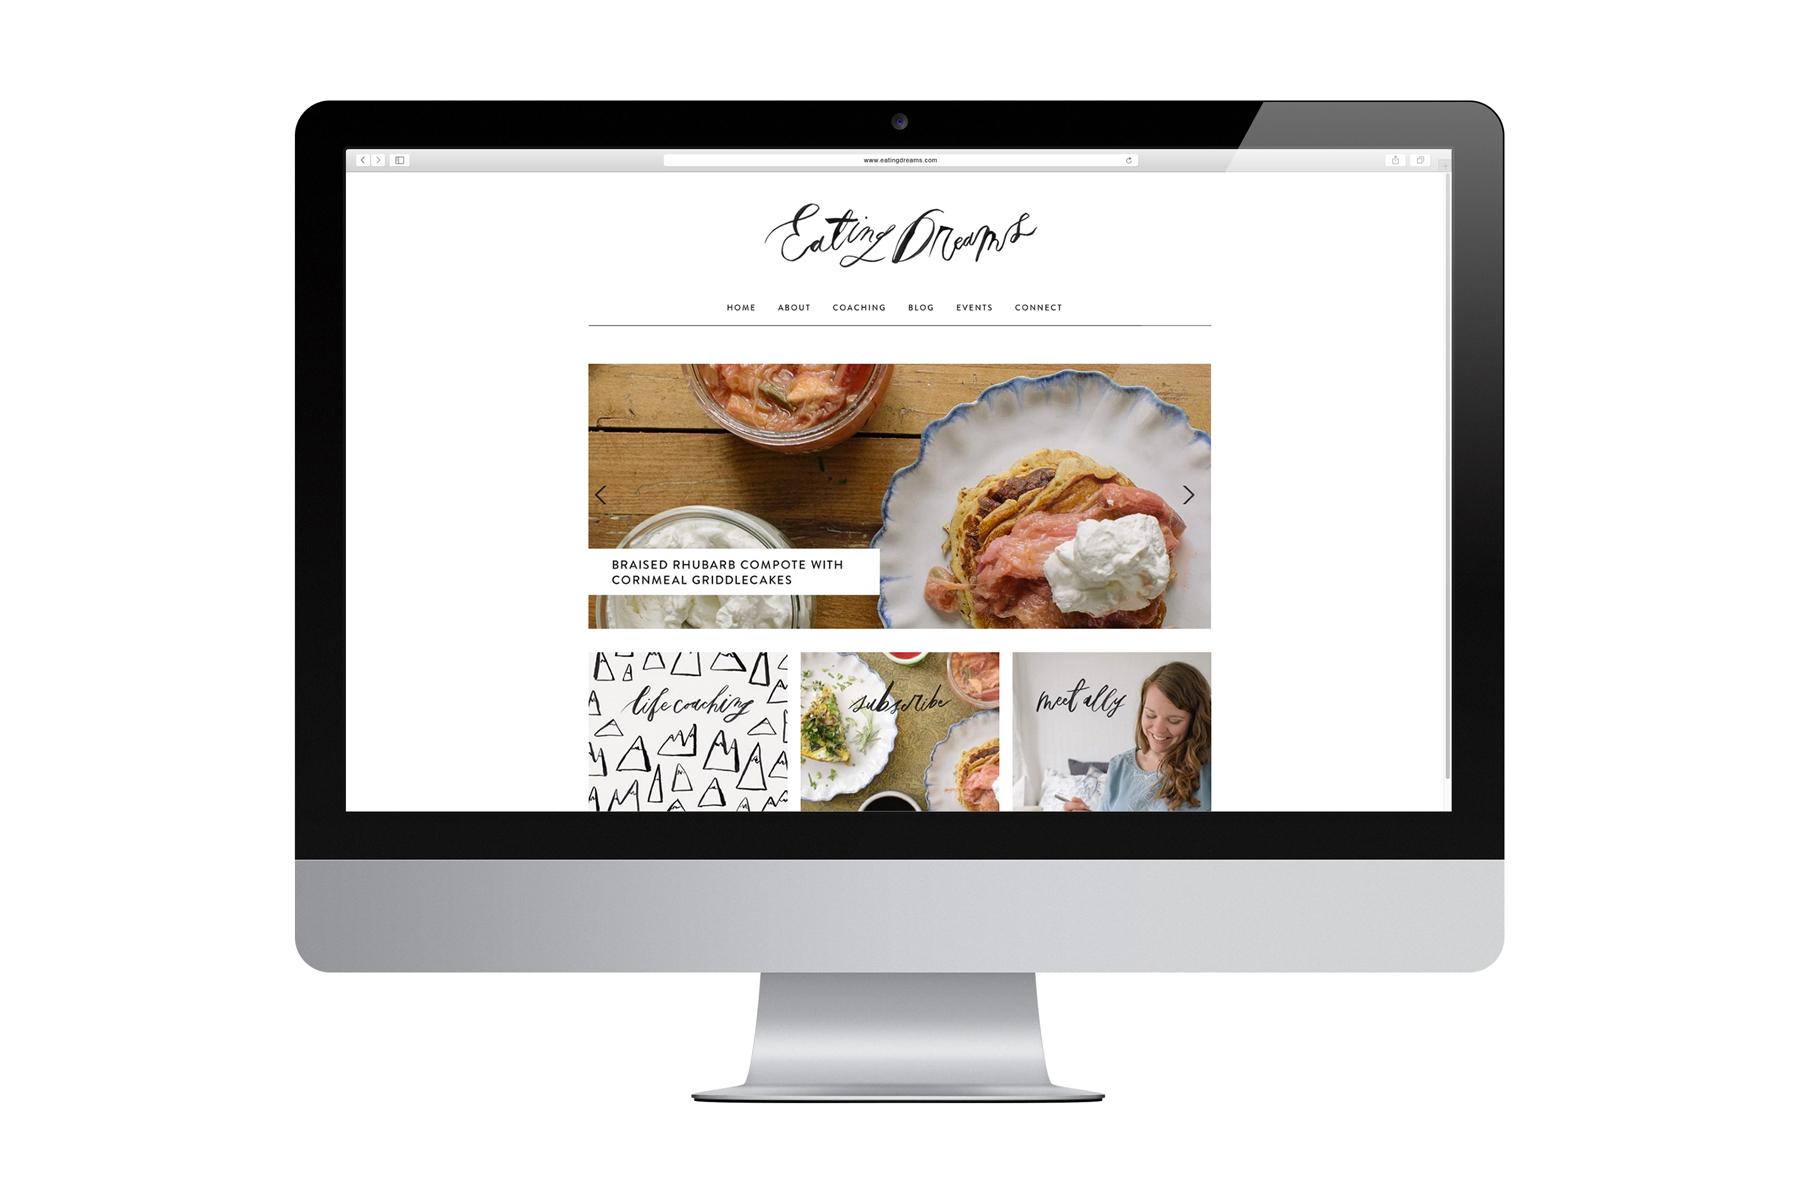 Eating-Dreams_Website-Design_Rachelle-Sartini-Garner_3A.jpg